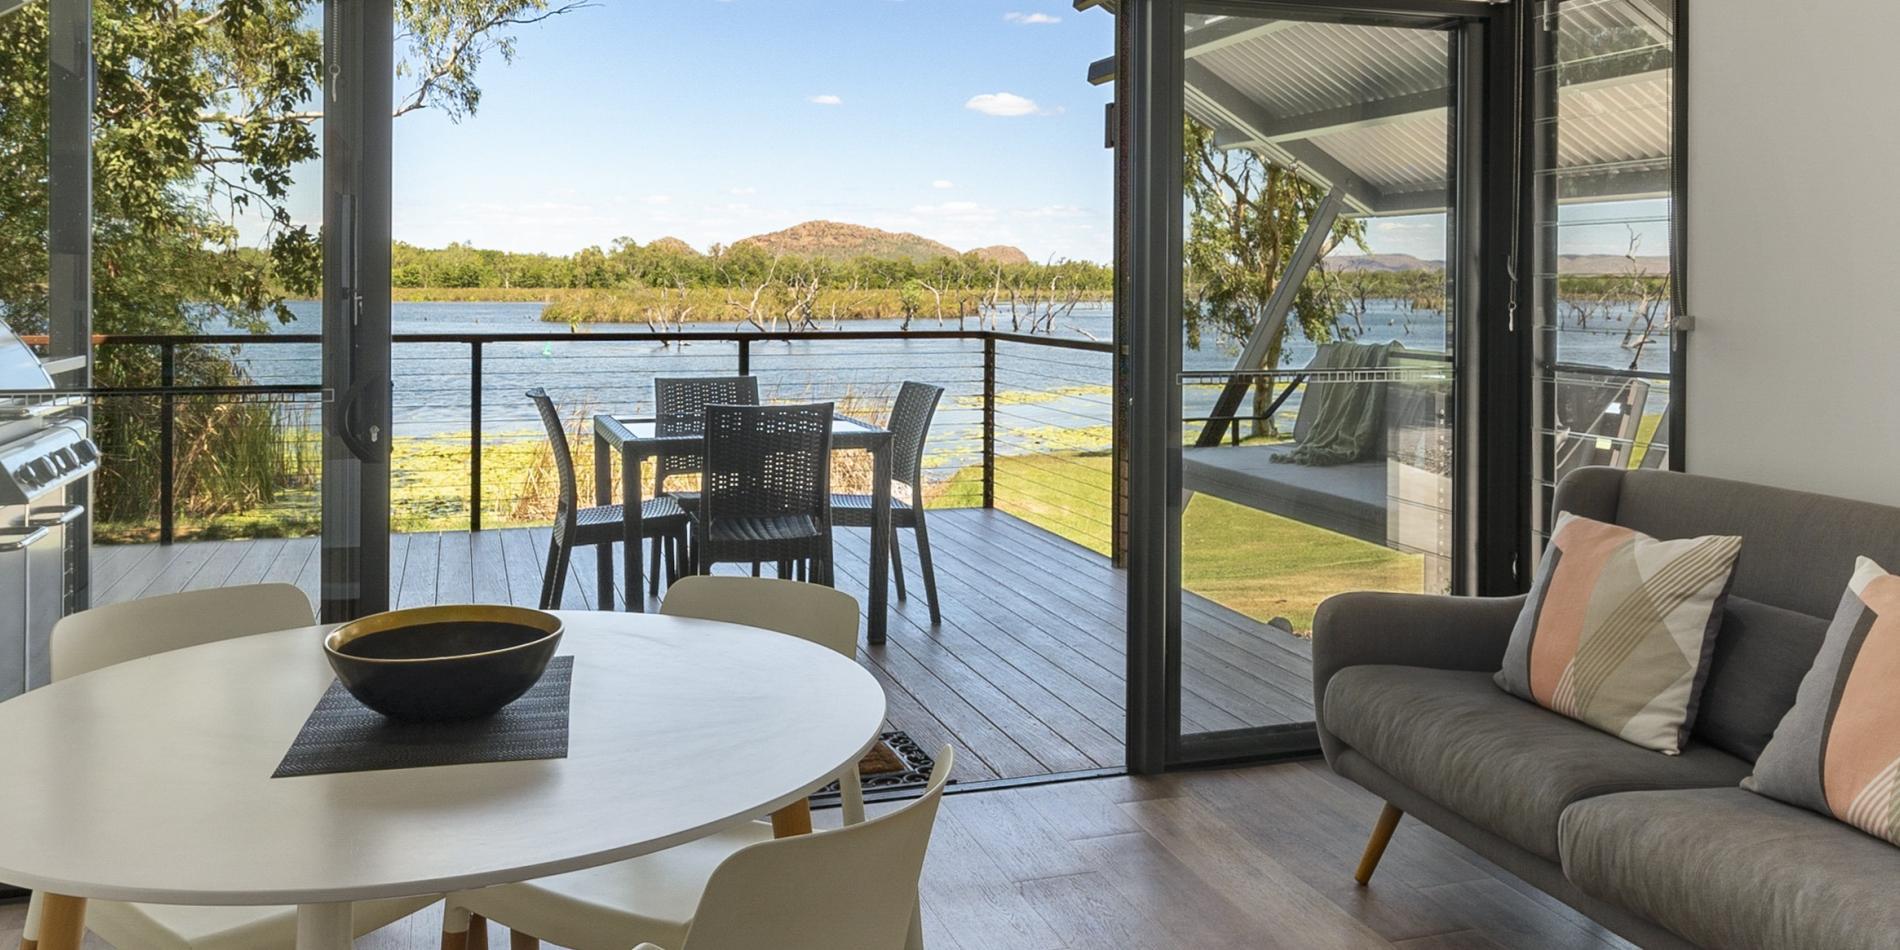 https://www.kimberleyland.com.au/sites/default/files/styles/feature/public/Waterfront%20Villa%20at%20Kimberleyland?itok=nd3A7MwS